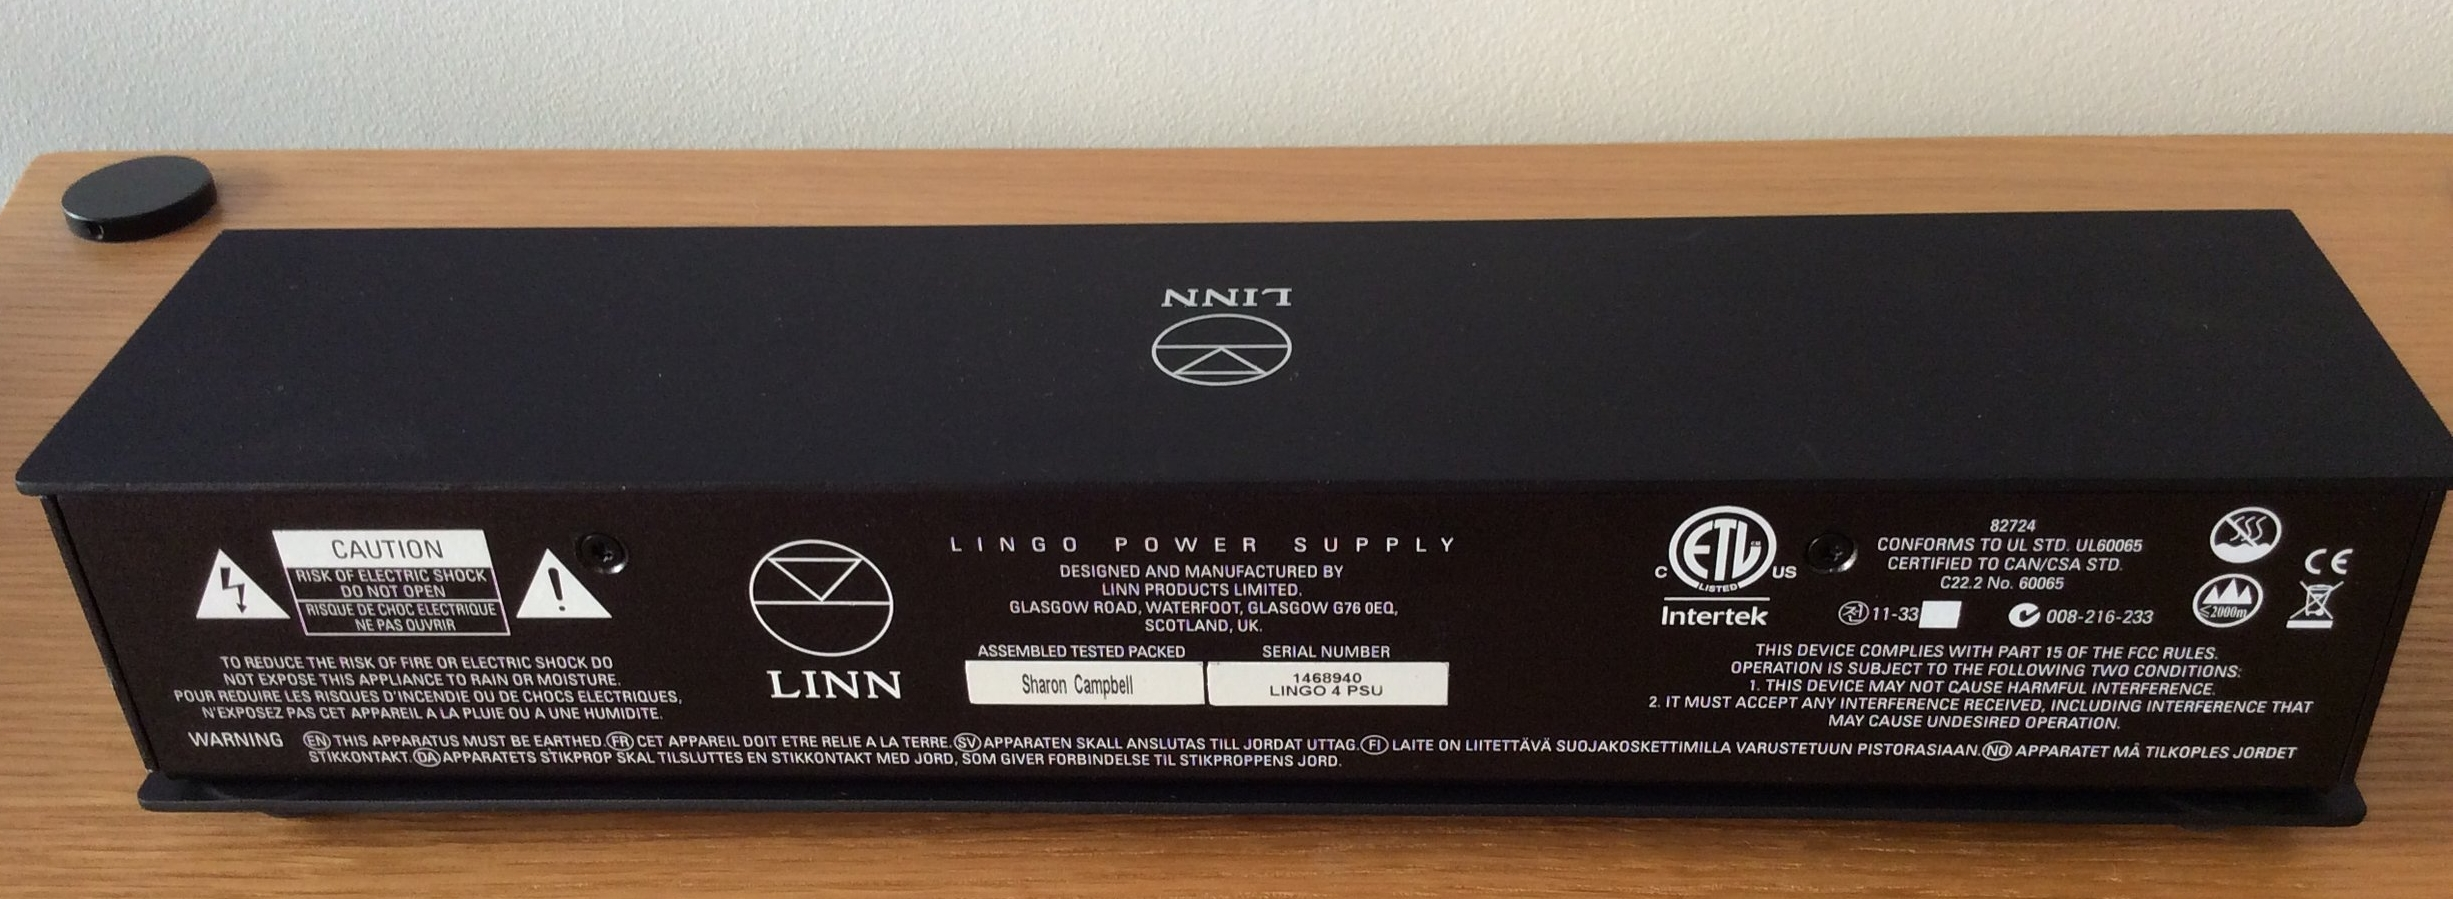 Lingo Power Supply